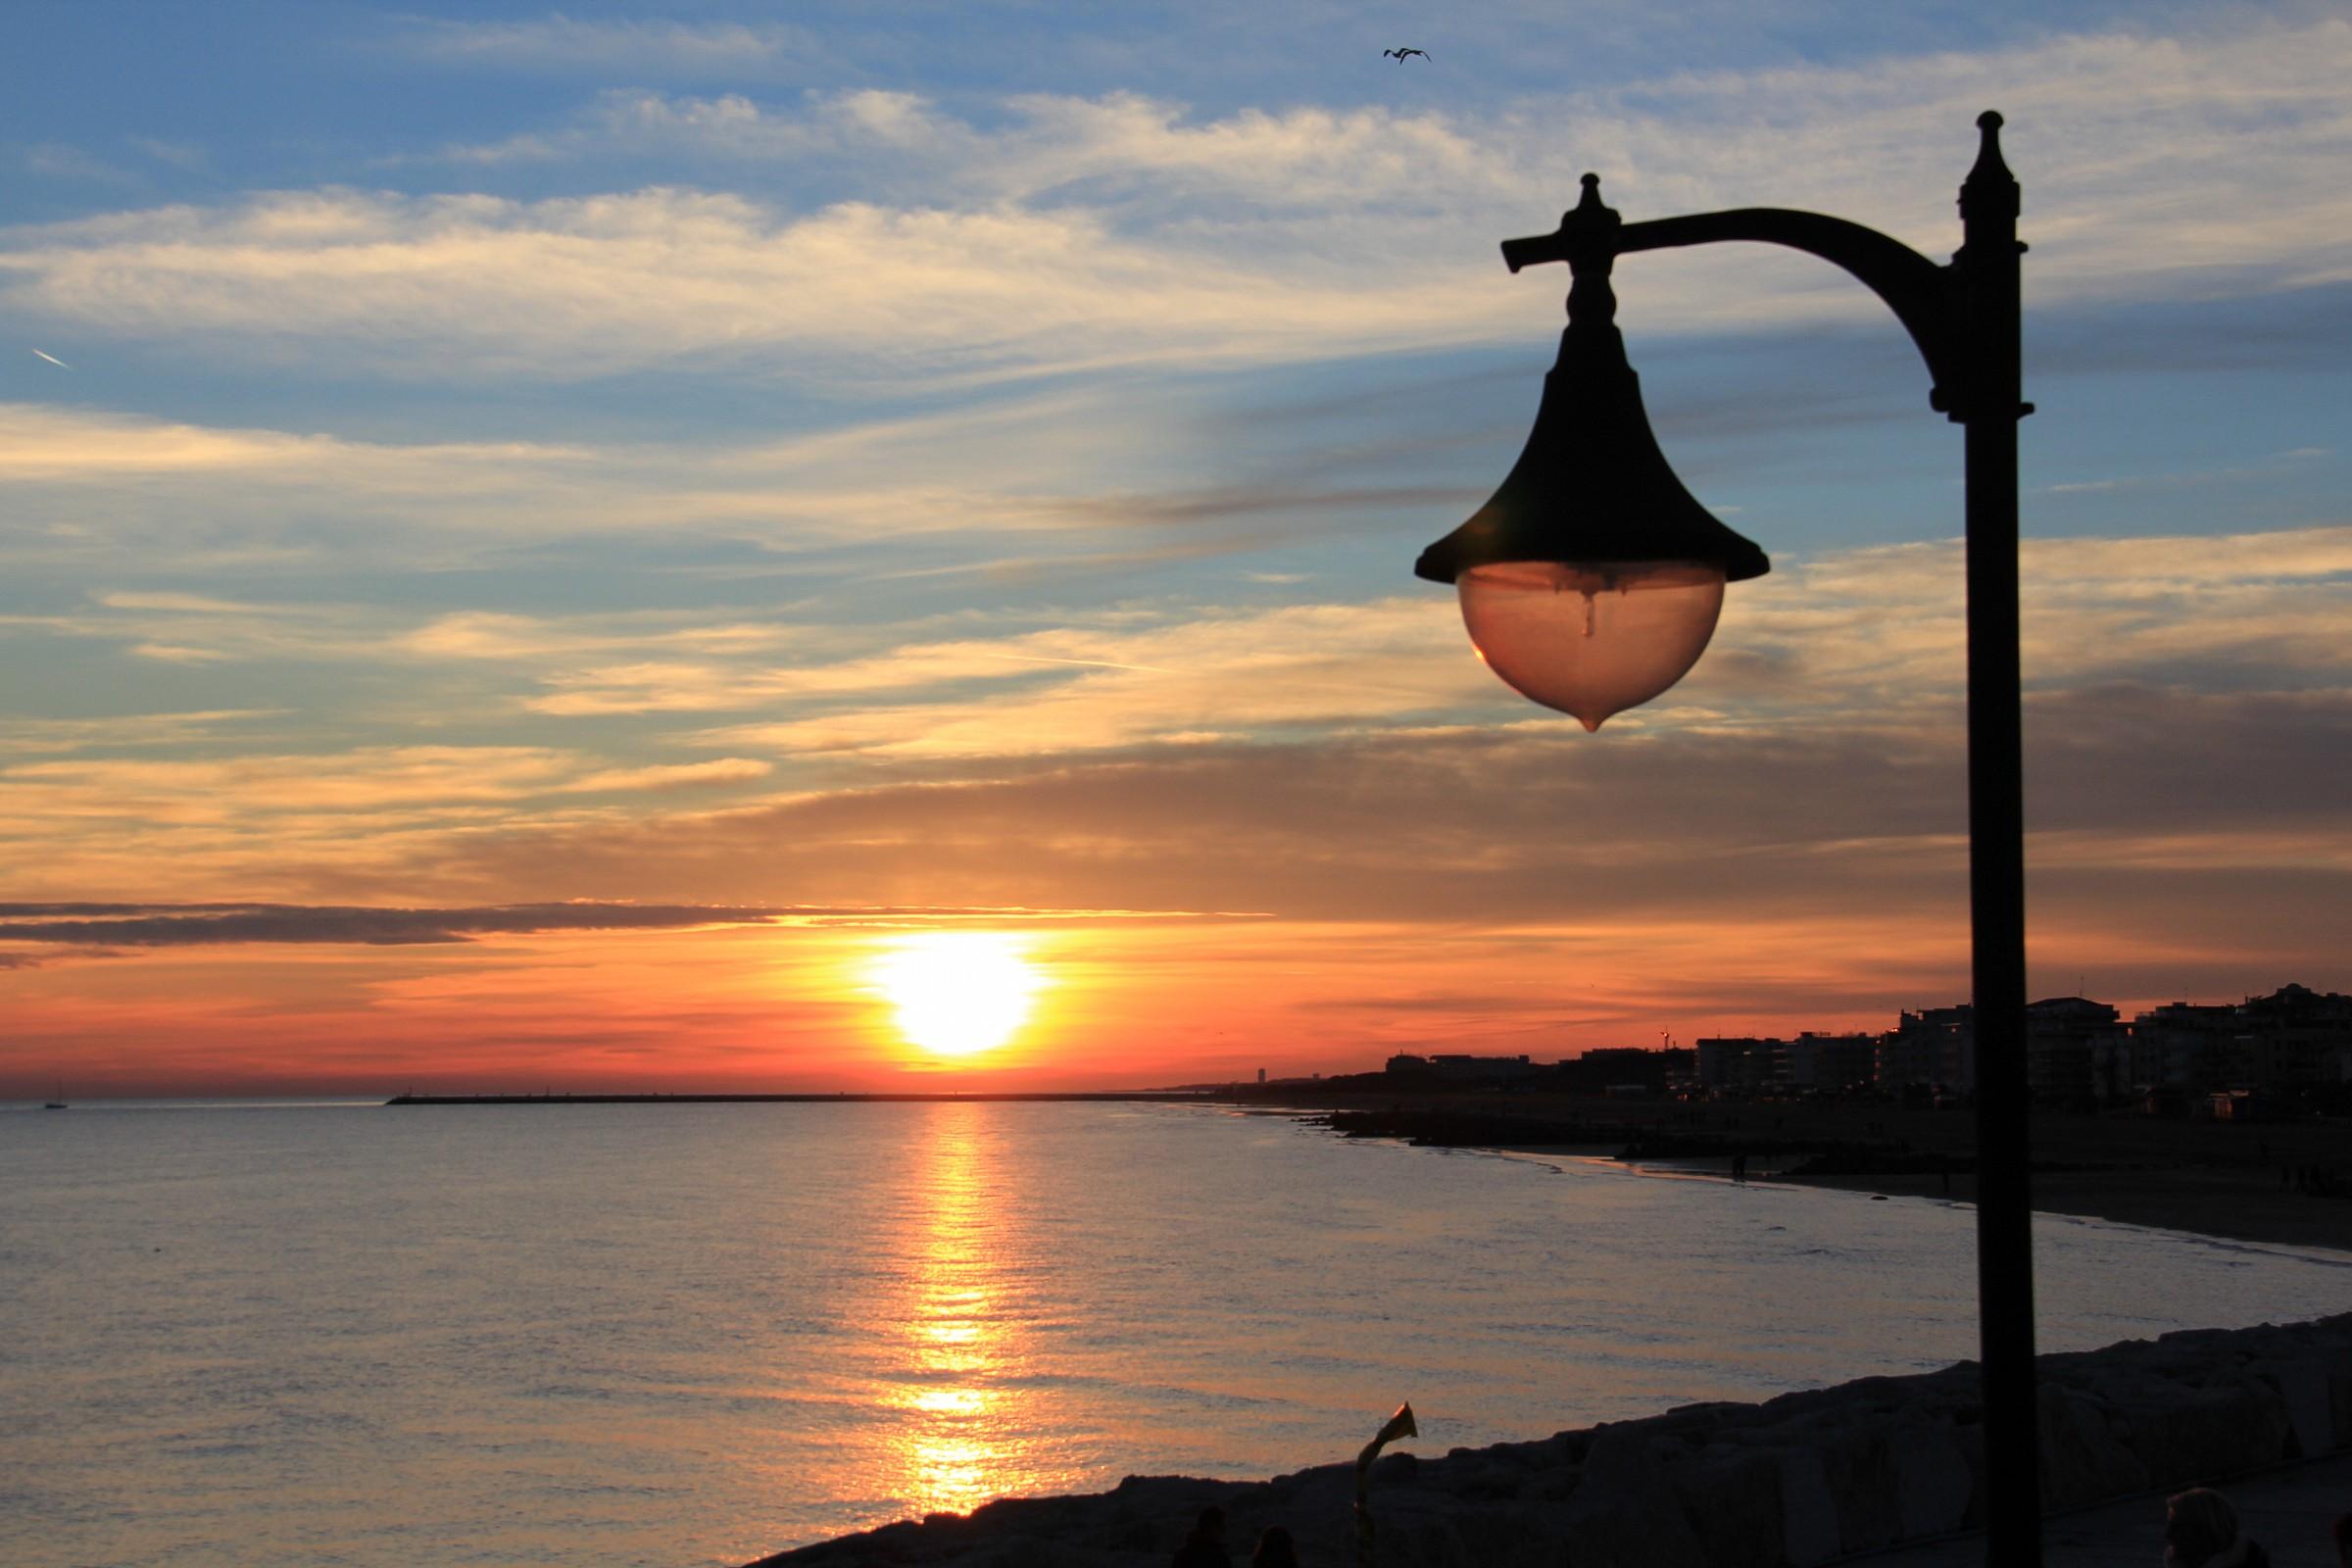 Sunset Caorle 2...